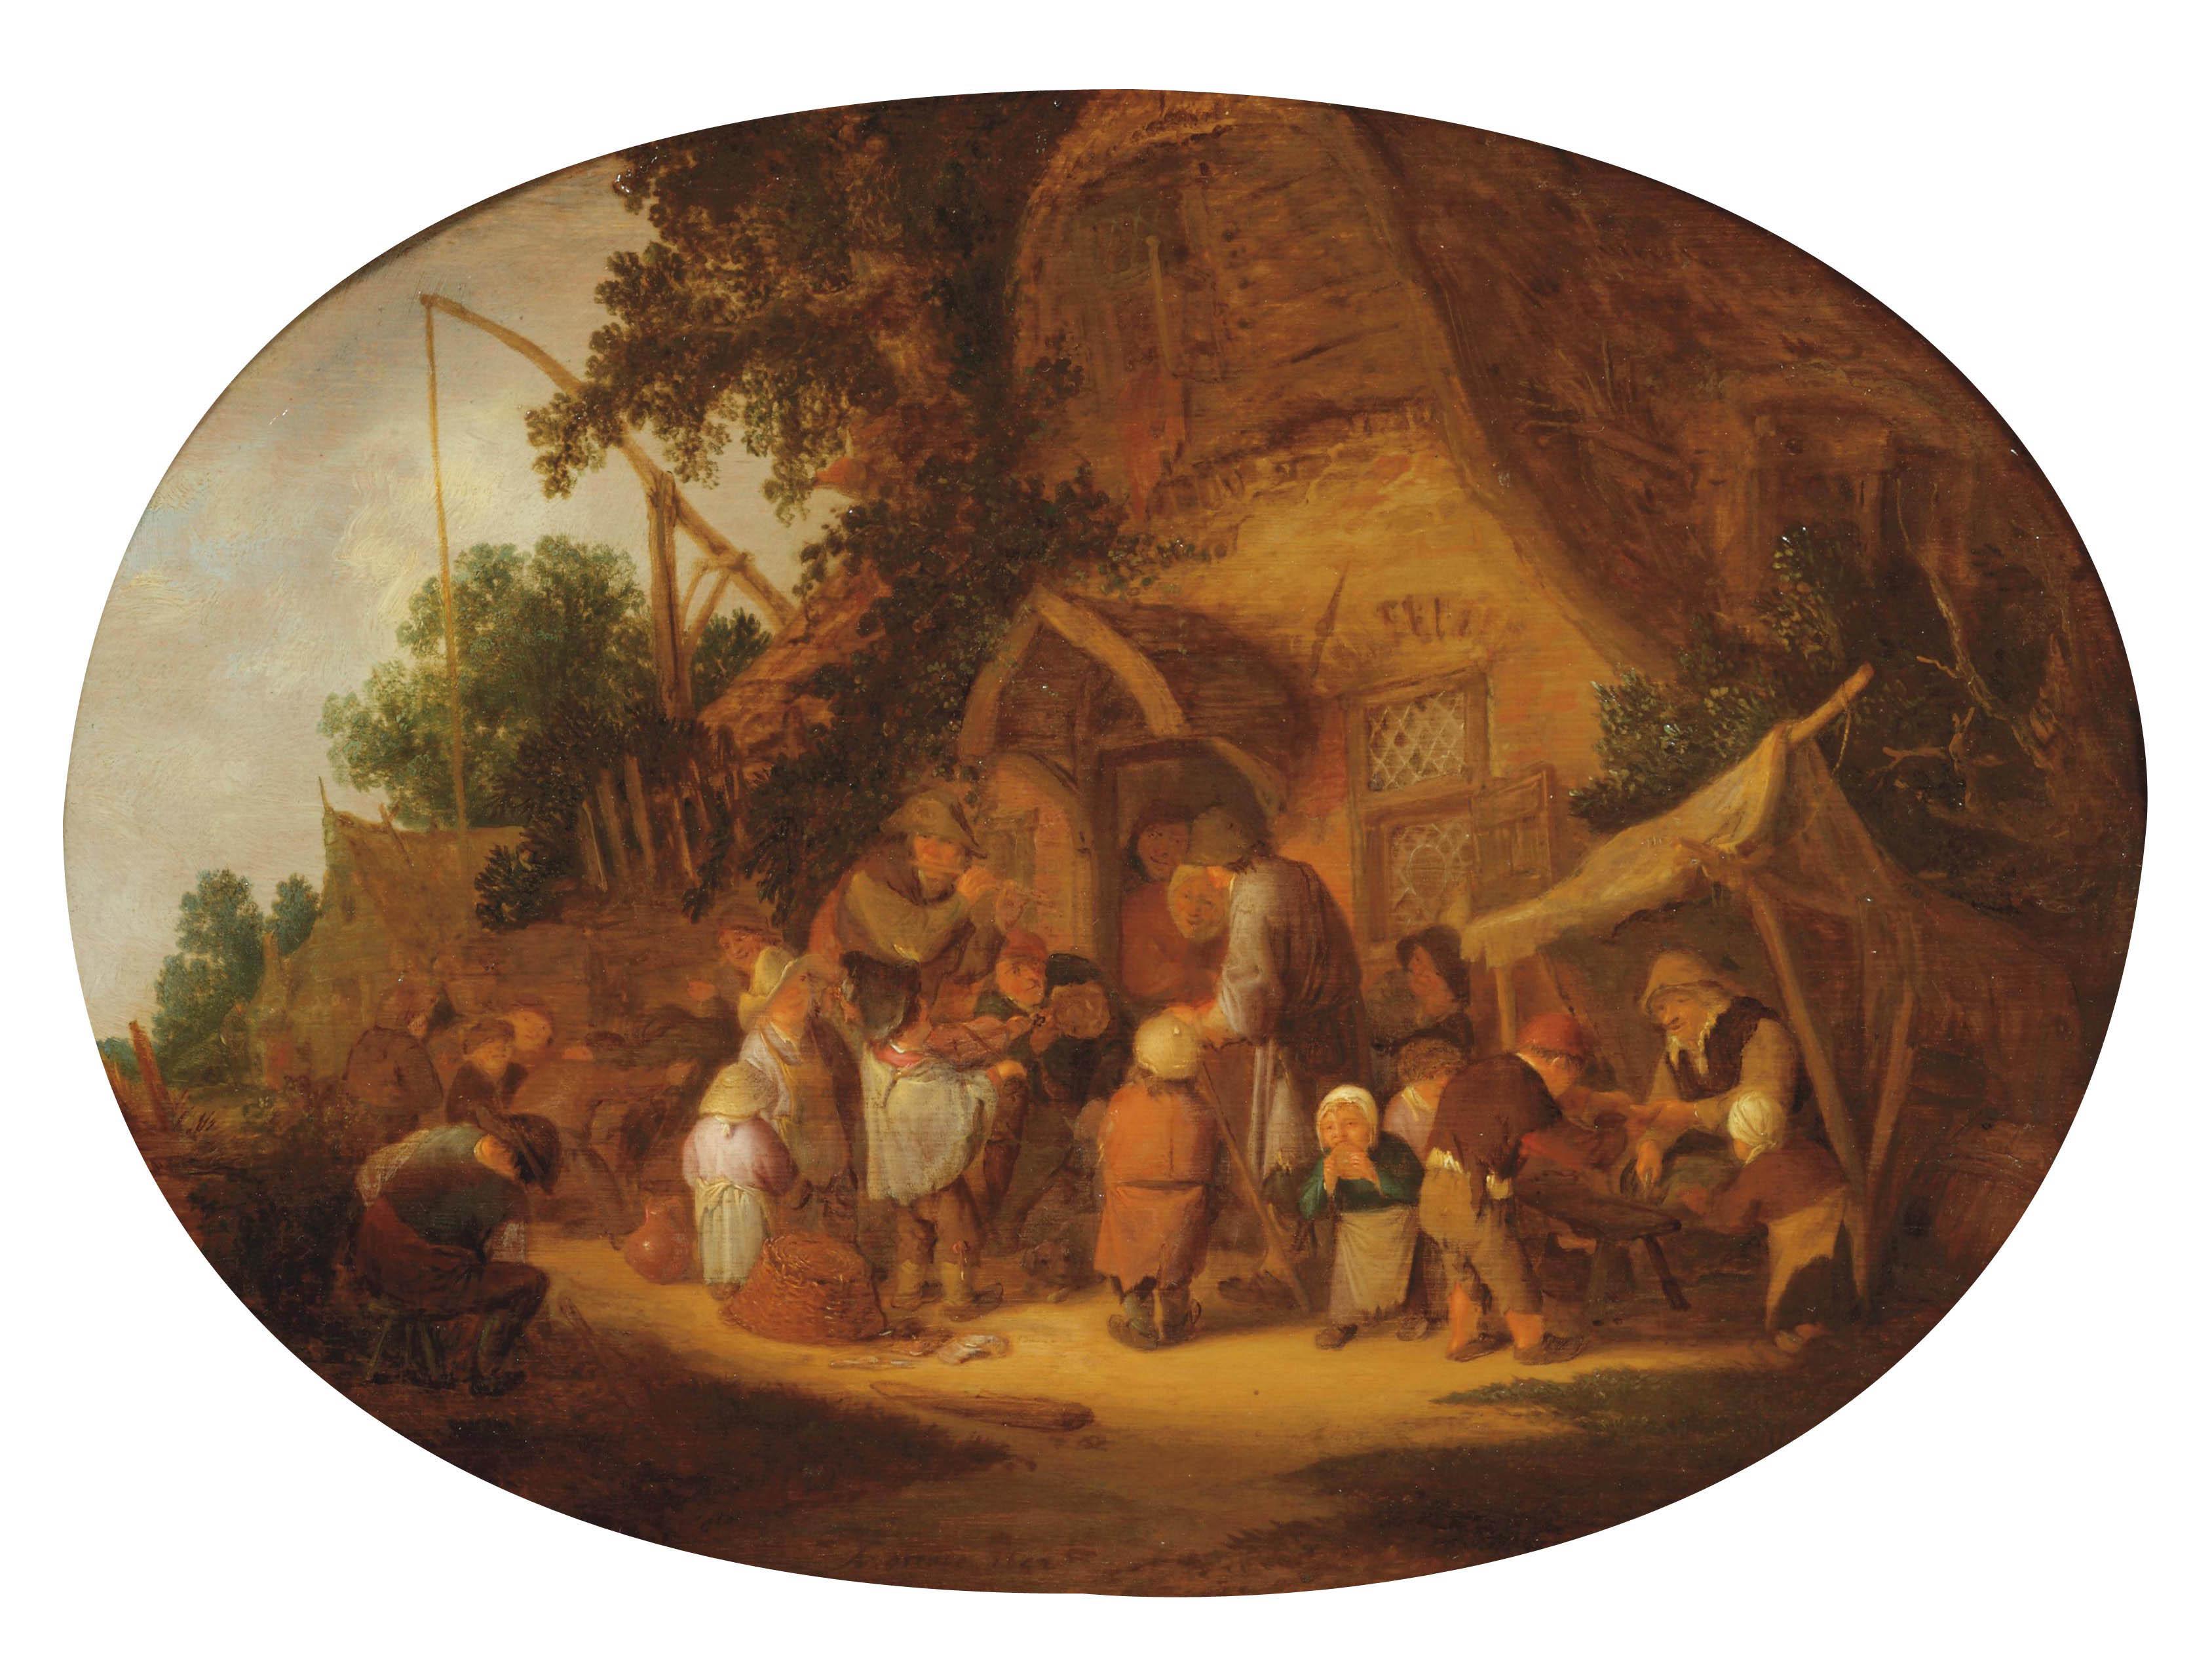 Adriaen van Ostade (Haarlem 1610-1685)